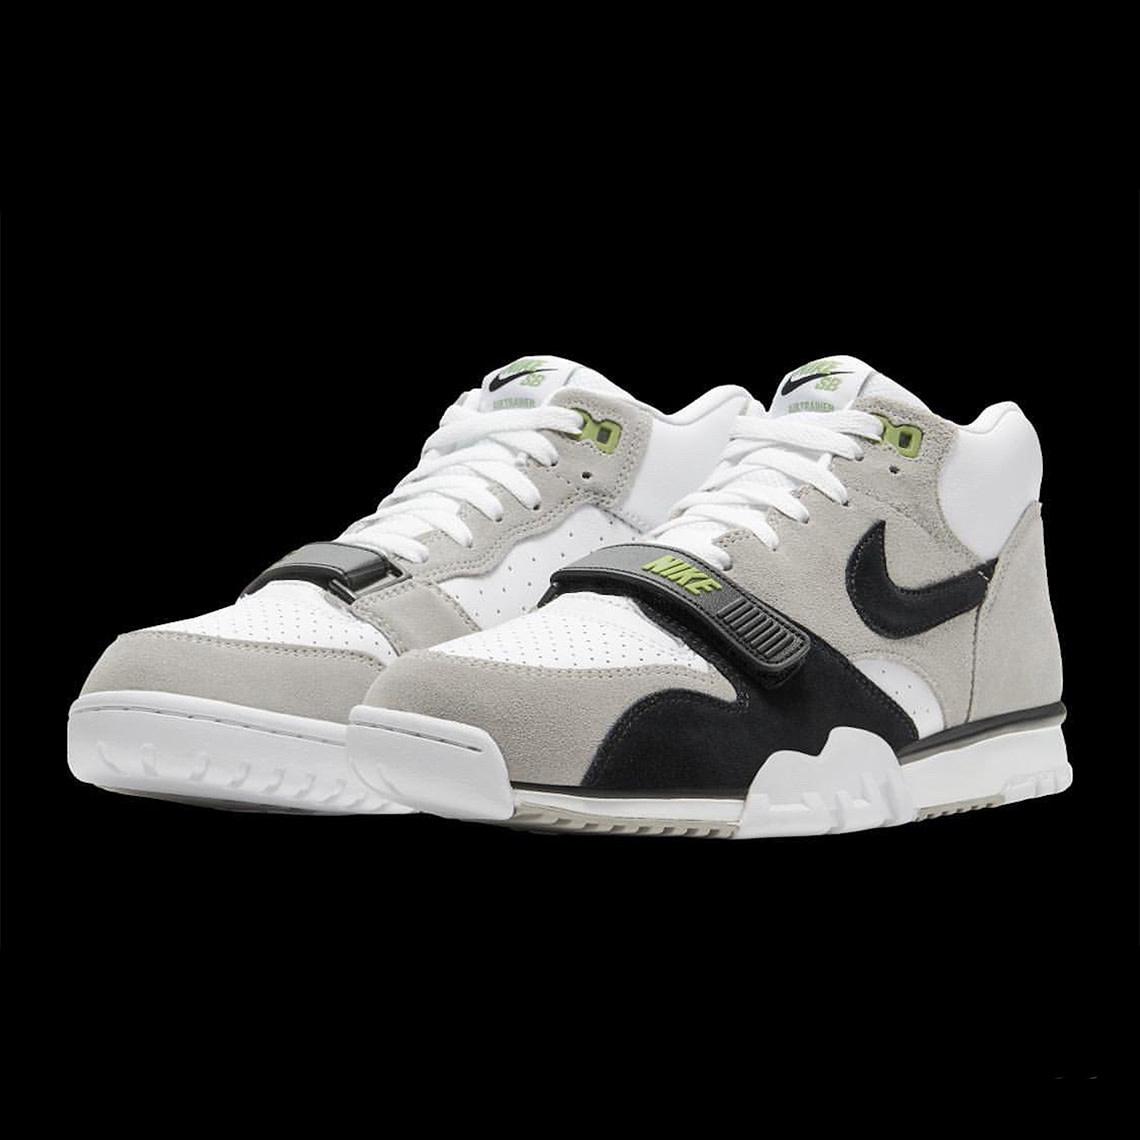 Nike USA, Inc. Nike SB Air Trainer 1 ISO Chlorophyll Grey/White